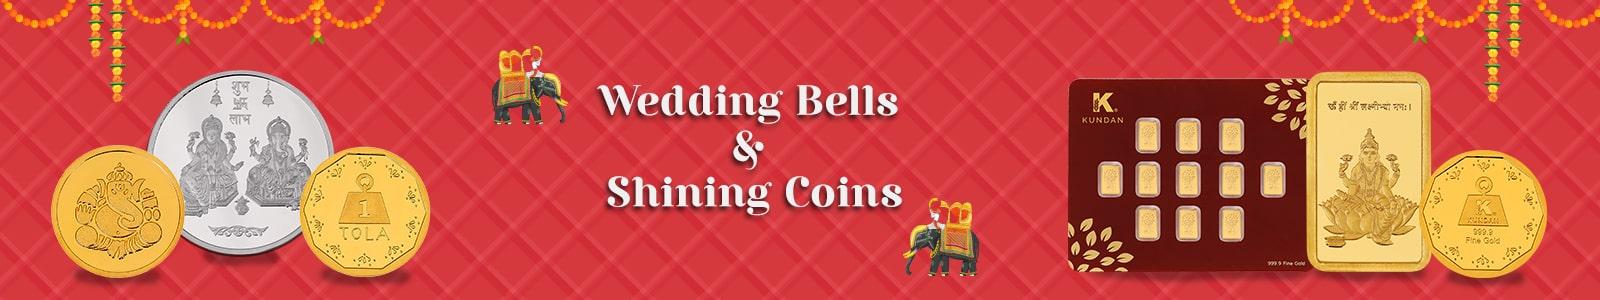 Wedding Bells & Shining Coins